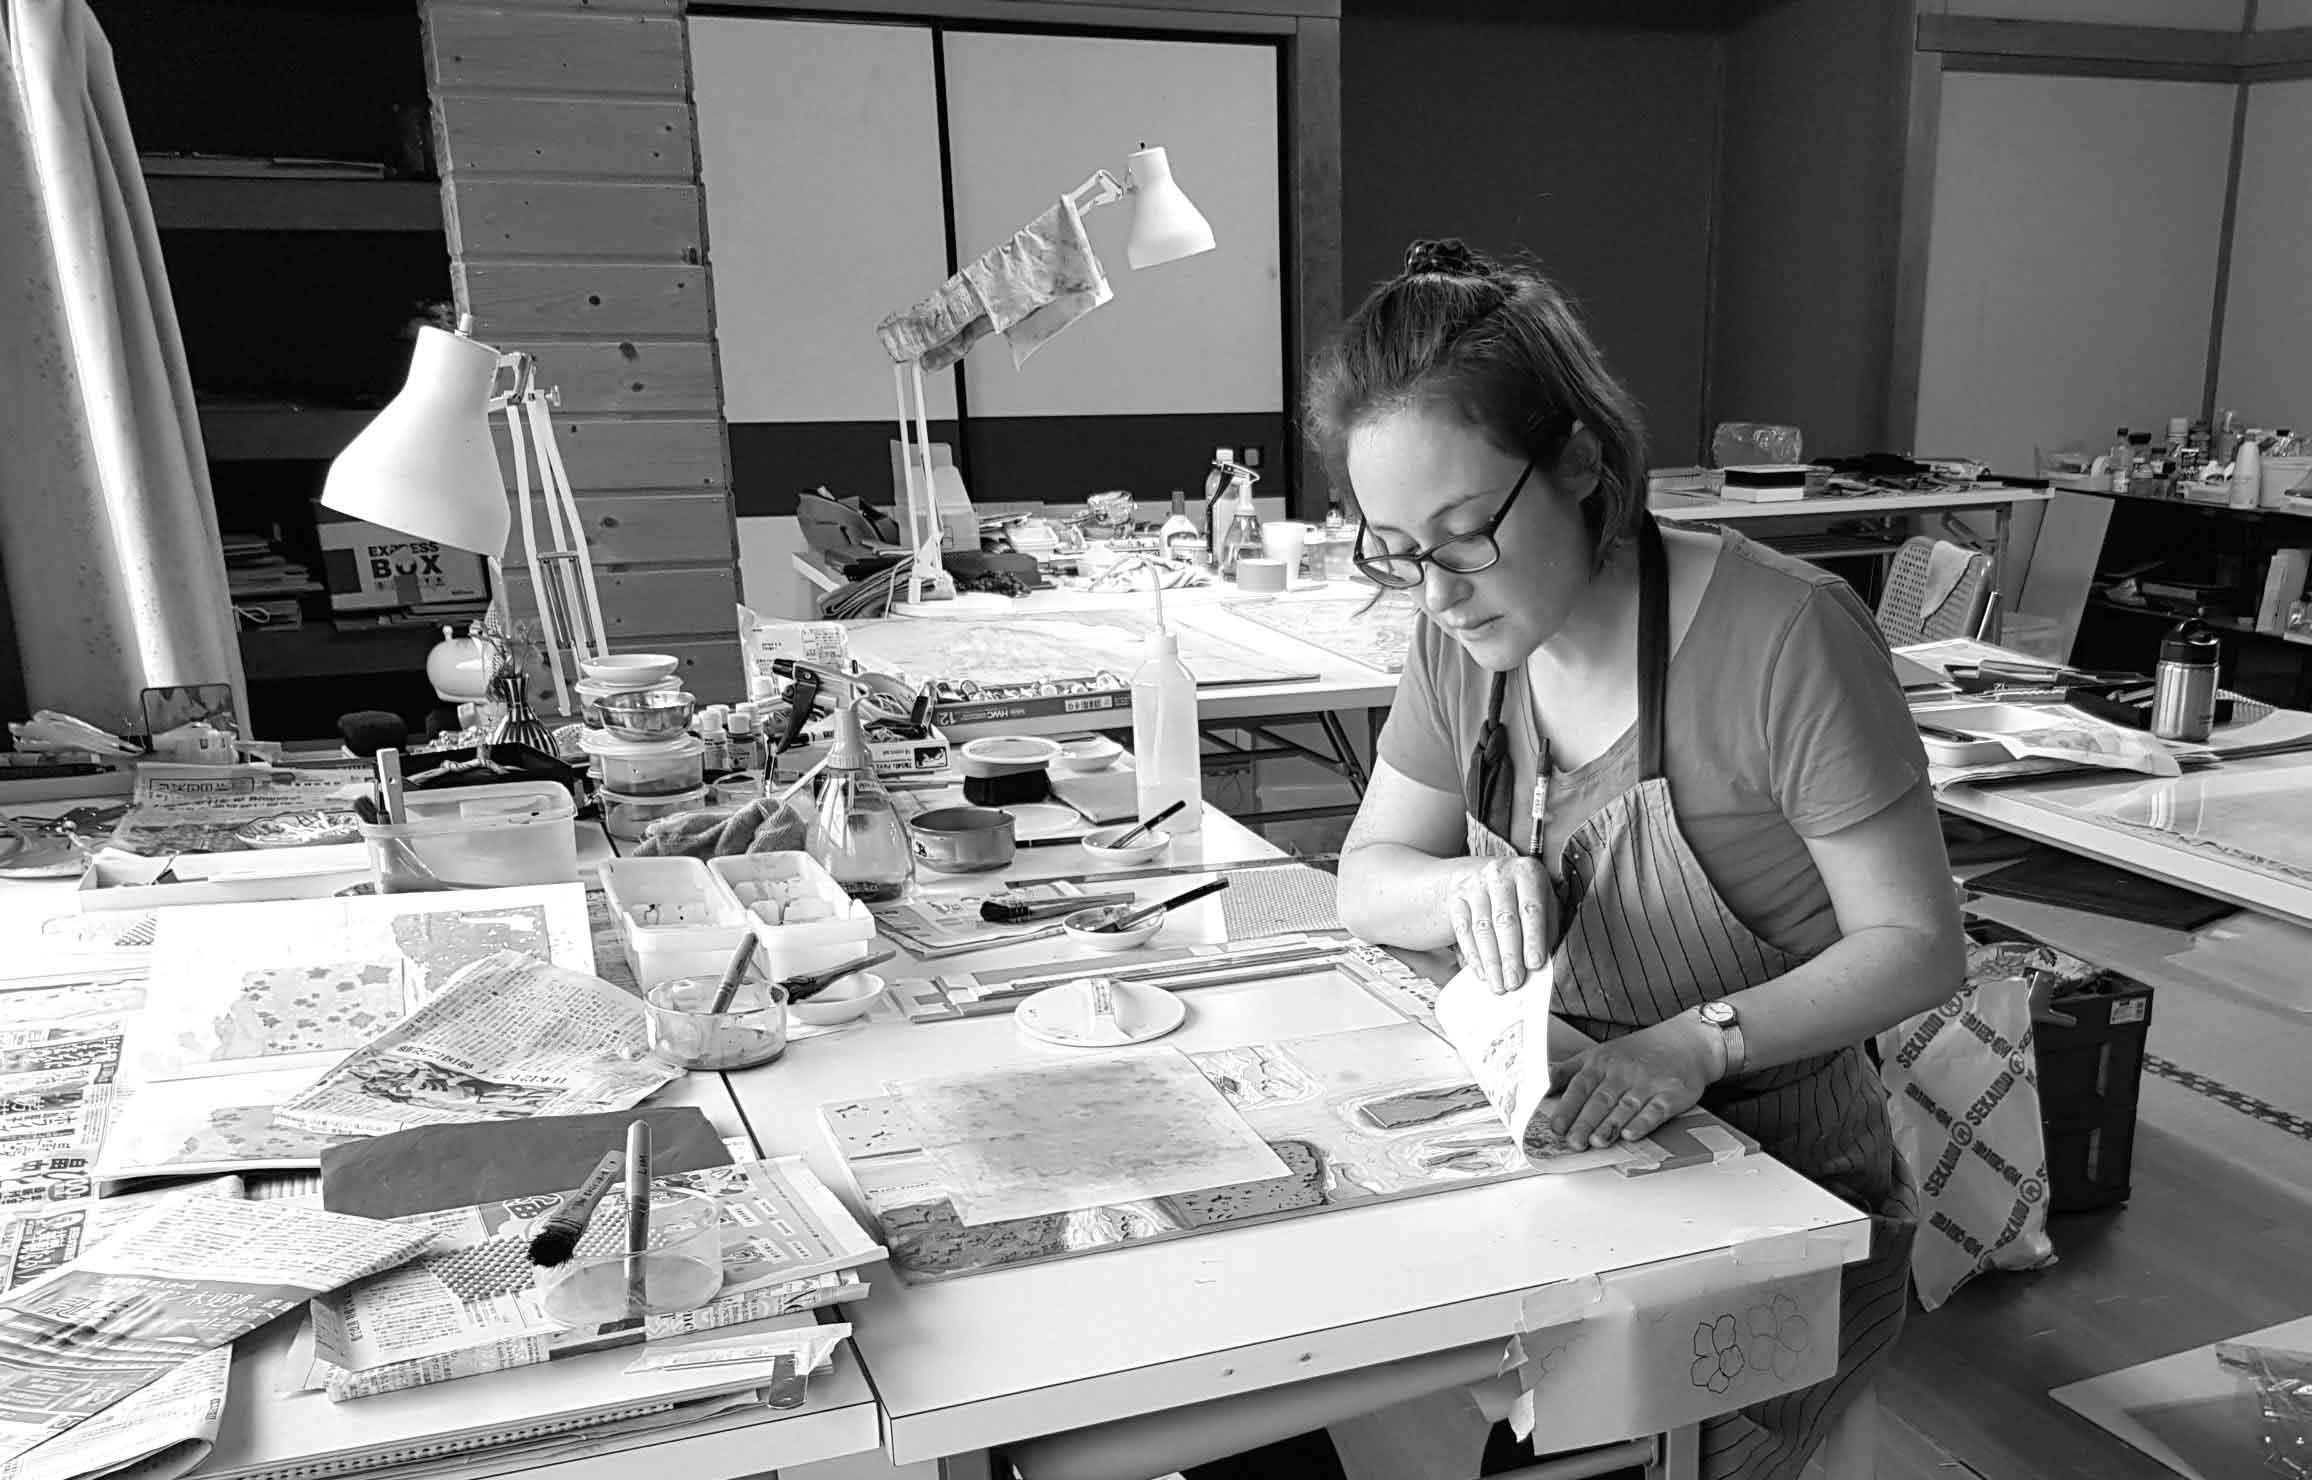 Jennifer in Japan at art residency